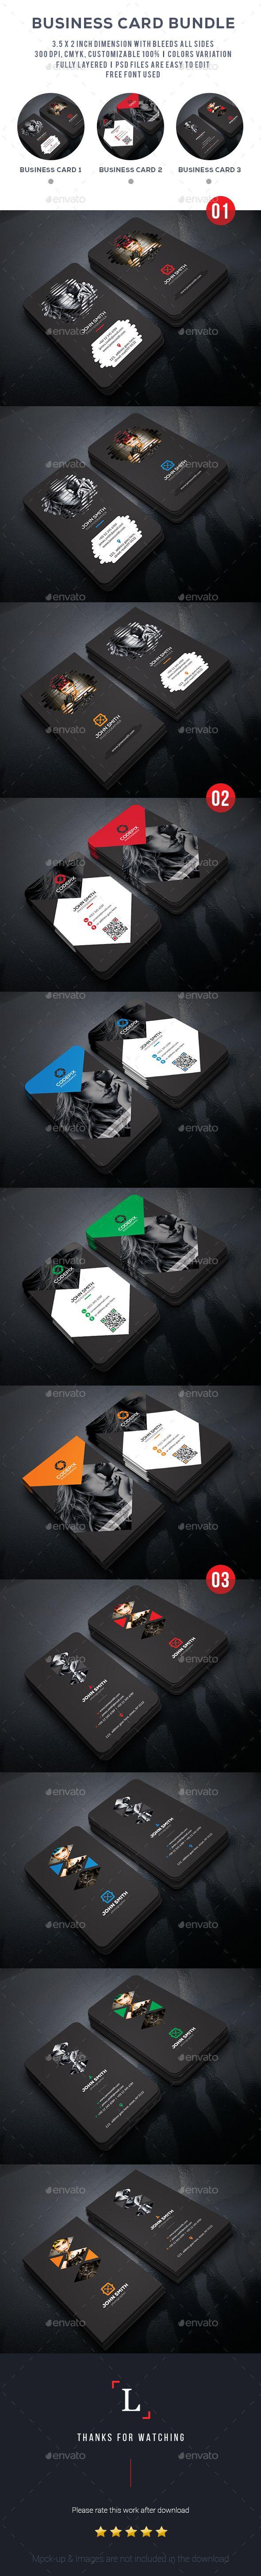 Business Card Bundle 62 best Corporate Flyer